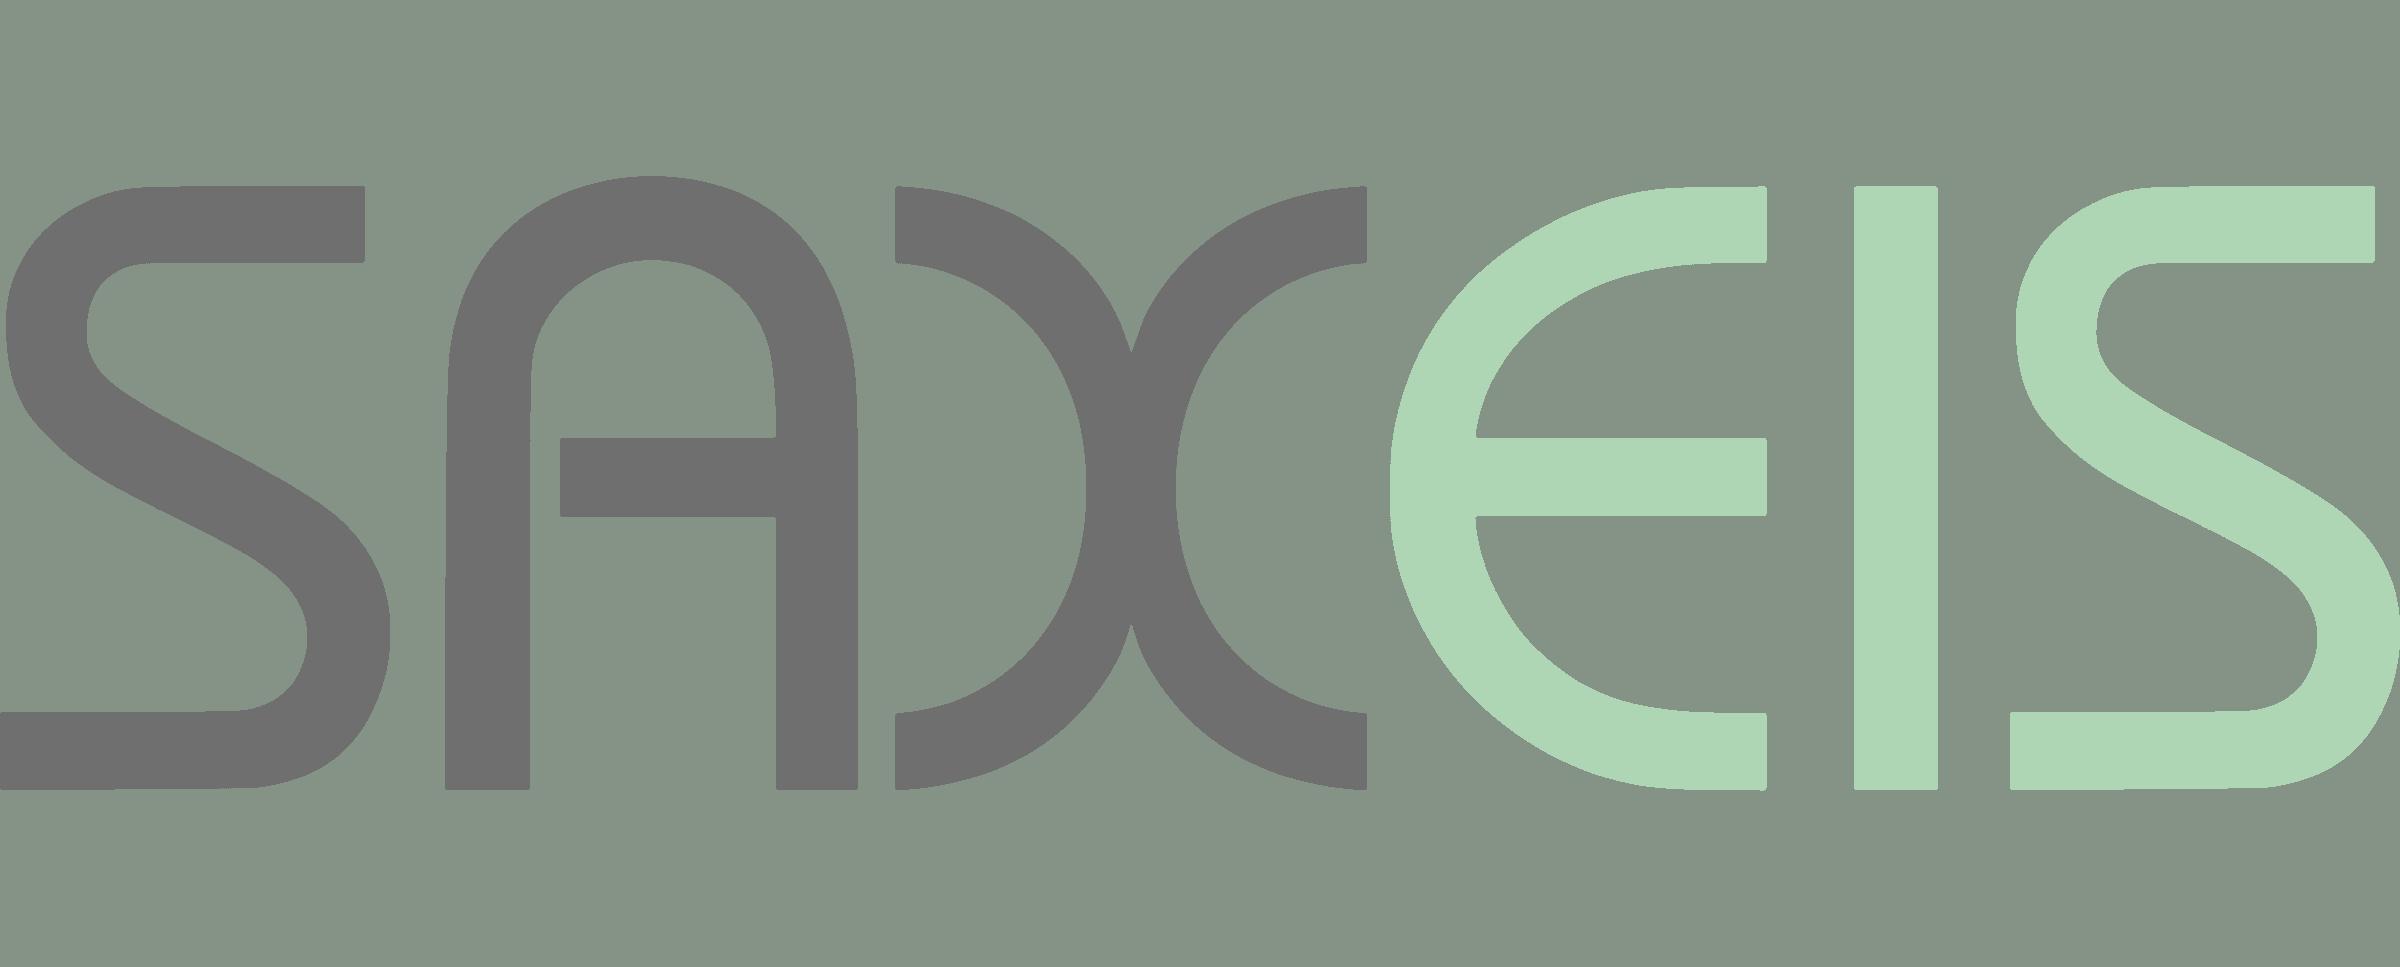 Sax Eis Logo